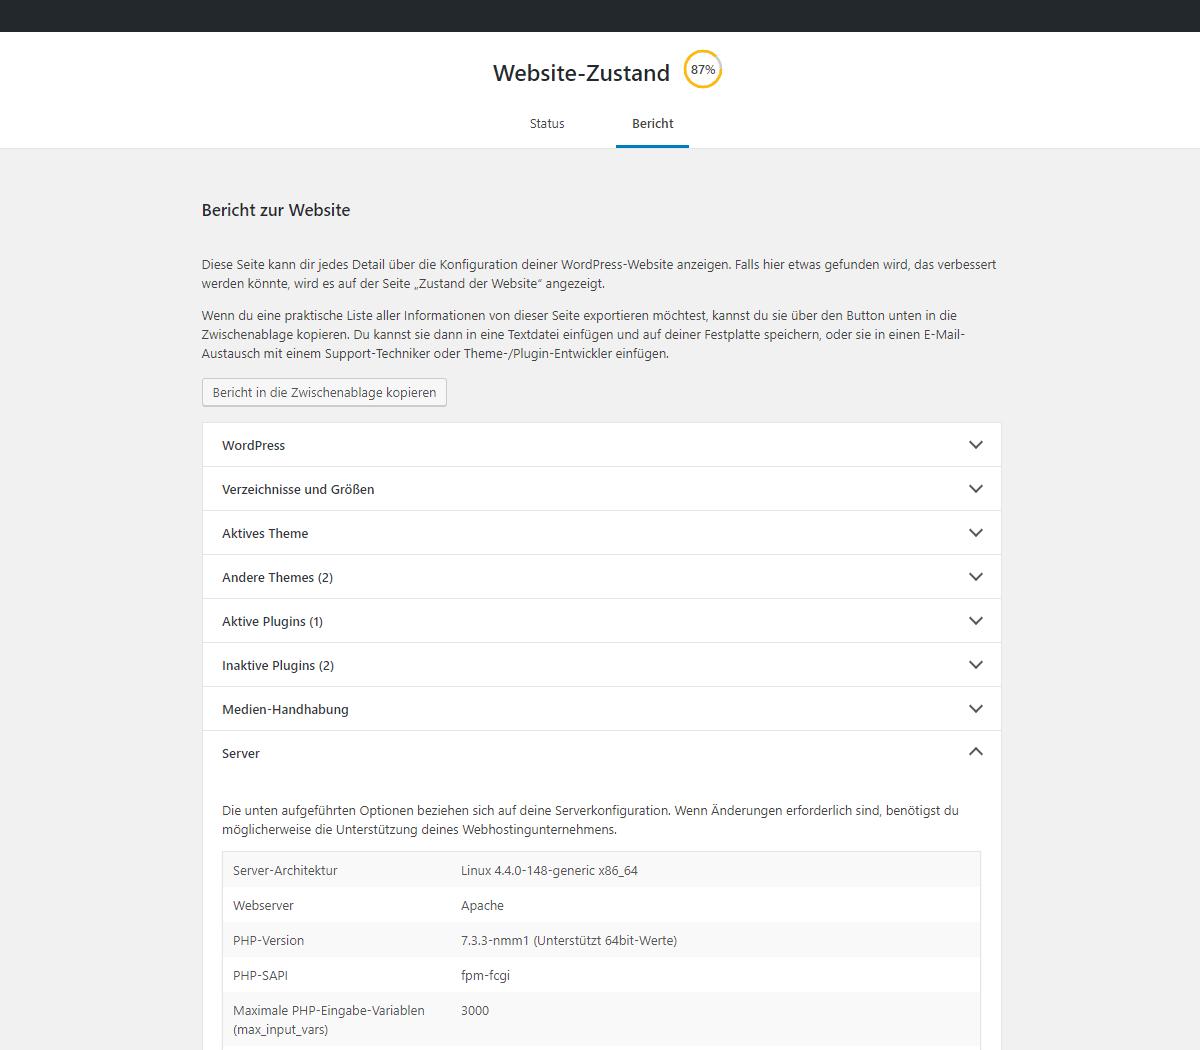 Wordpress Website Zustand Bericht